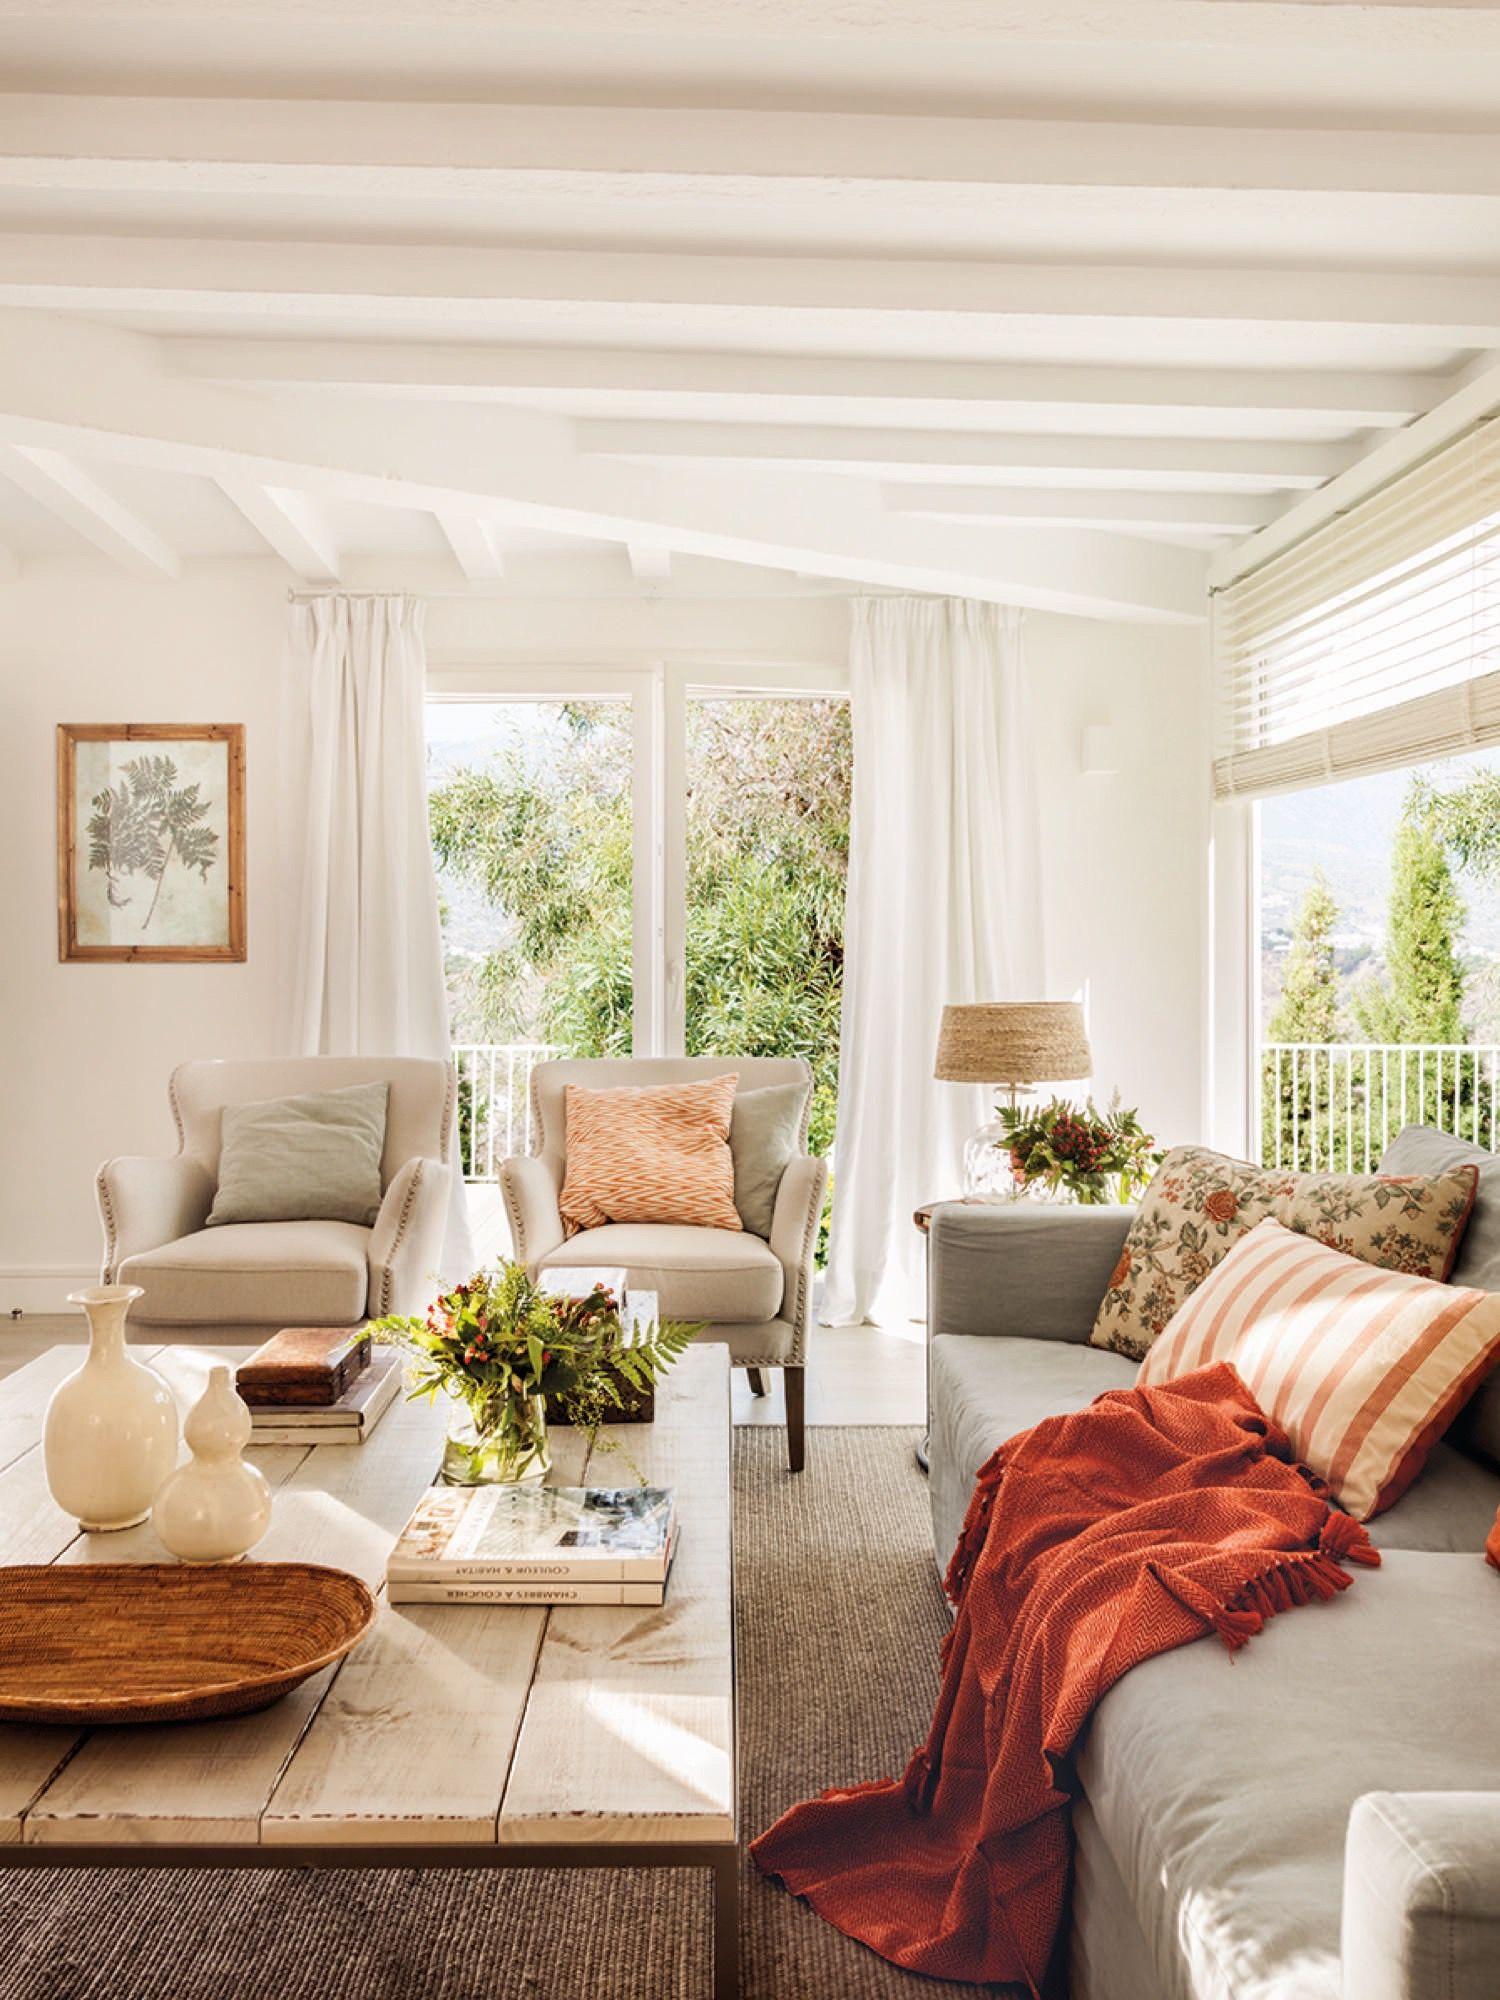 Casa Reformada En M Laga Con Aire R Stico Contempor Neo  # Muebles Roman Malaga